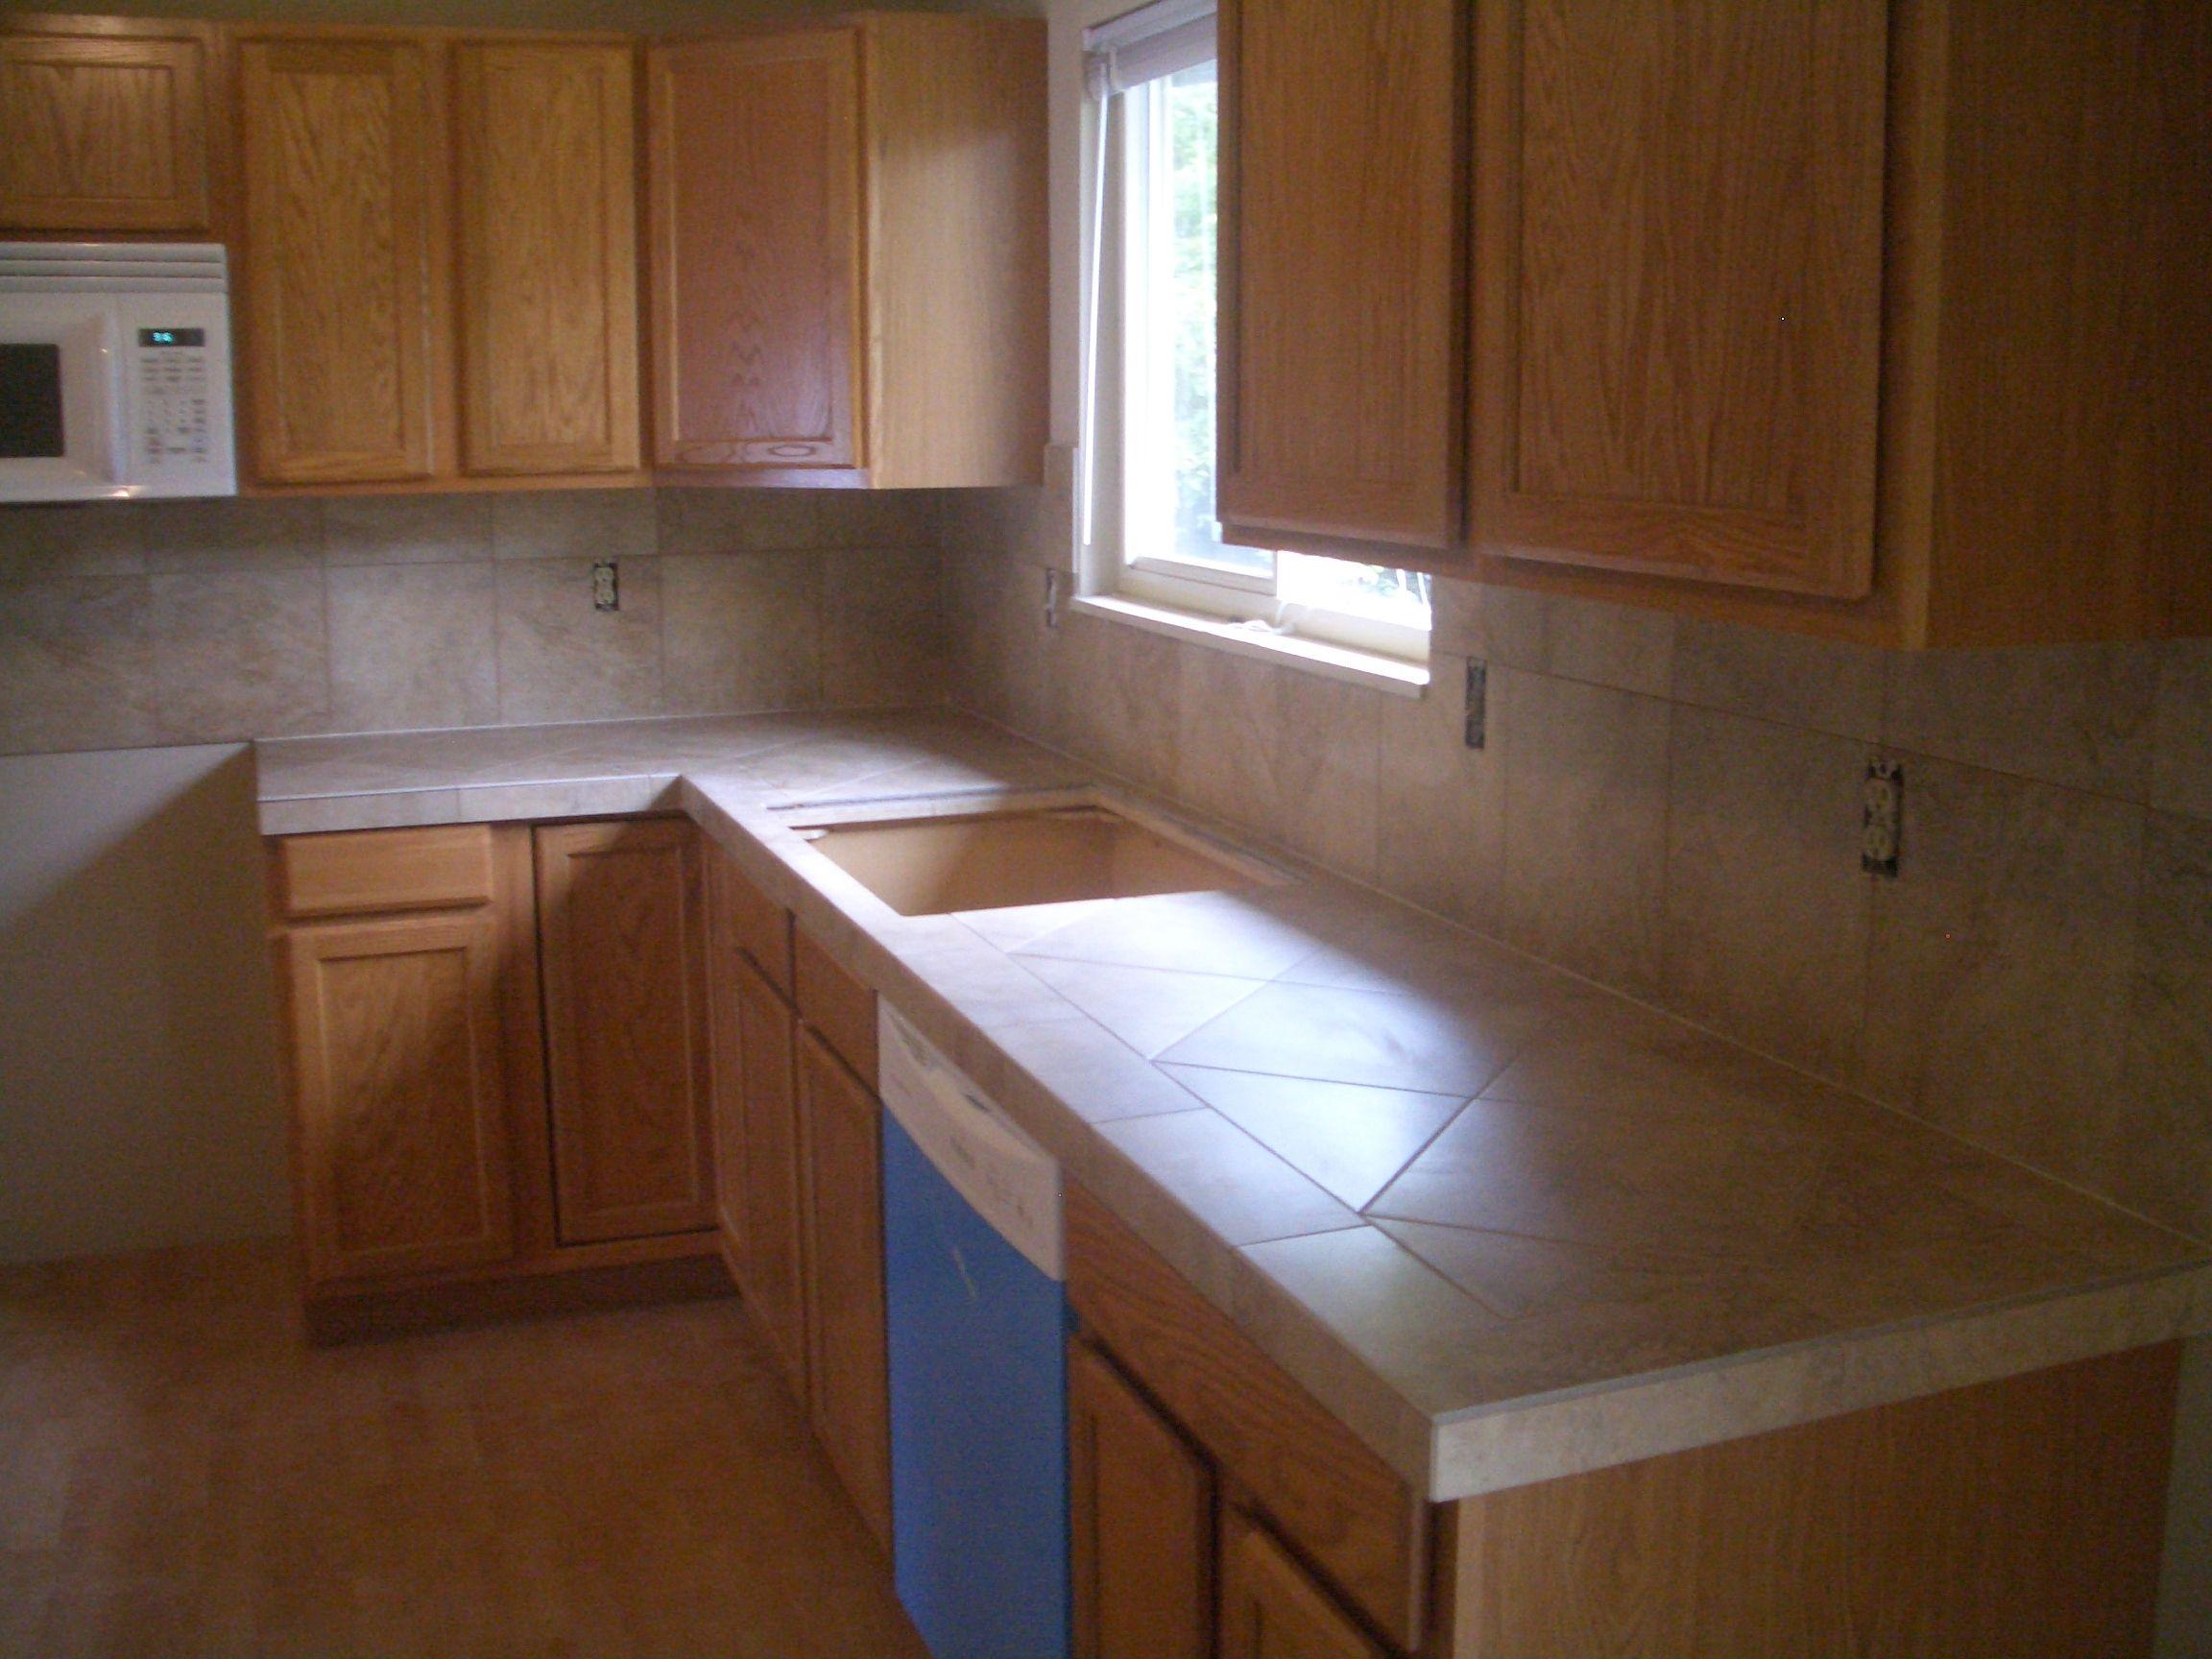 Porcelain Or Ceramic Tile For Kitchen Countertops Kitchen